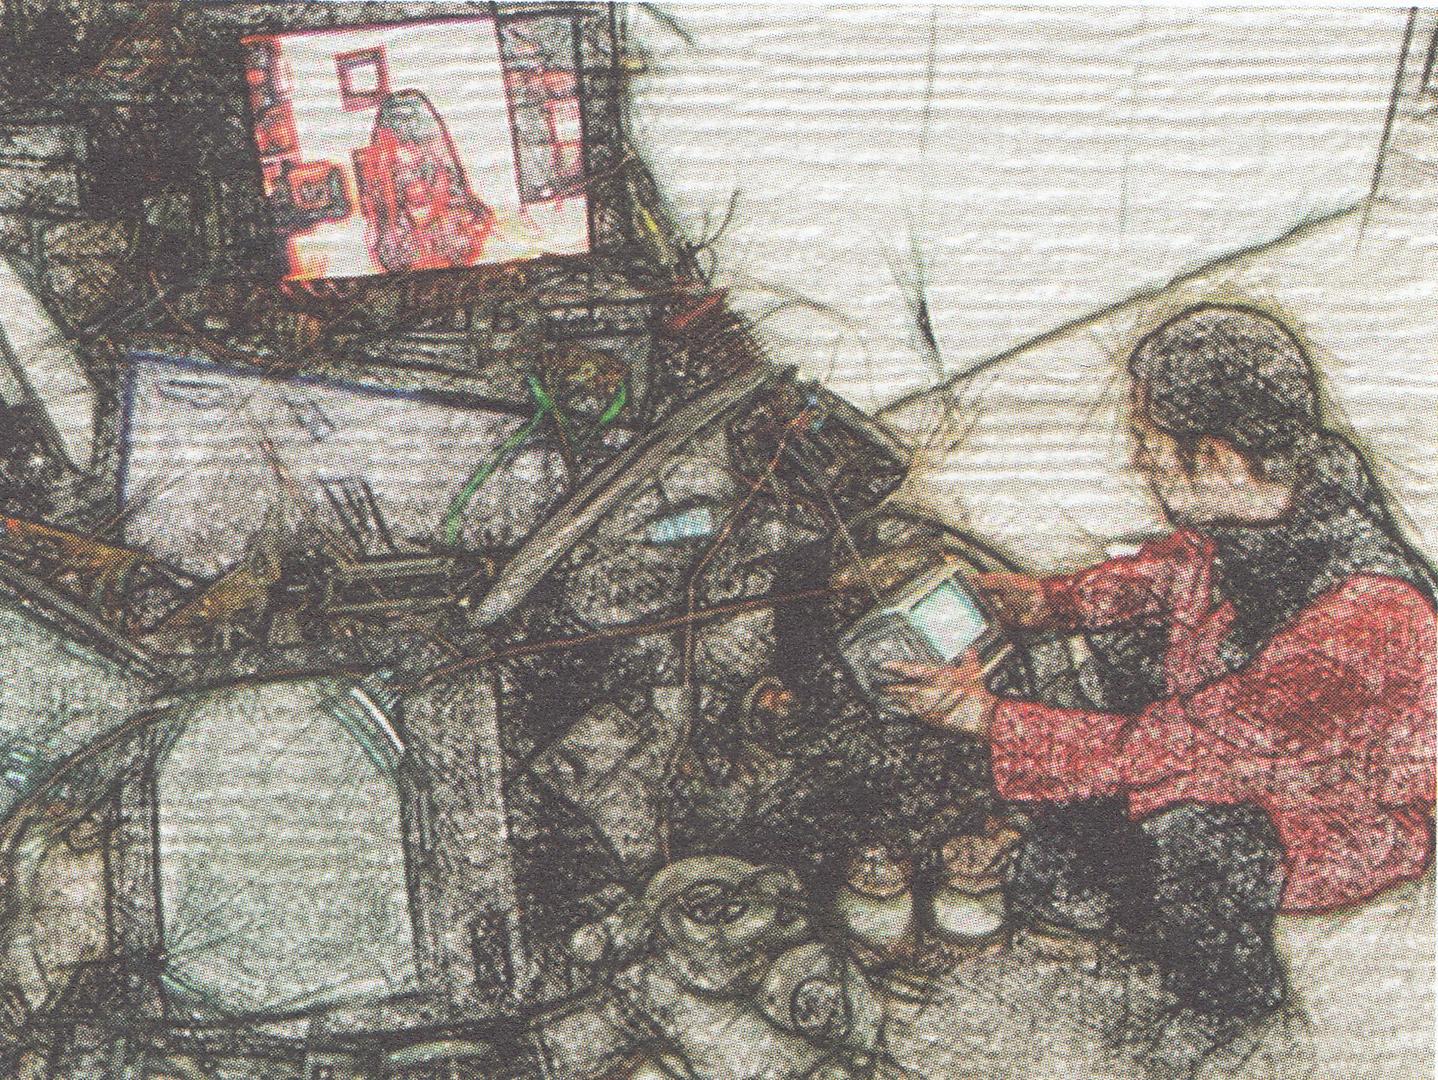 ©, Antonio Veneziano and Agnese Trocchi, Rebuilding the Chronovisor